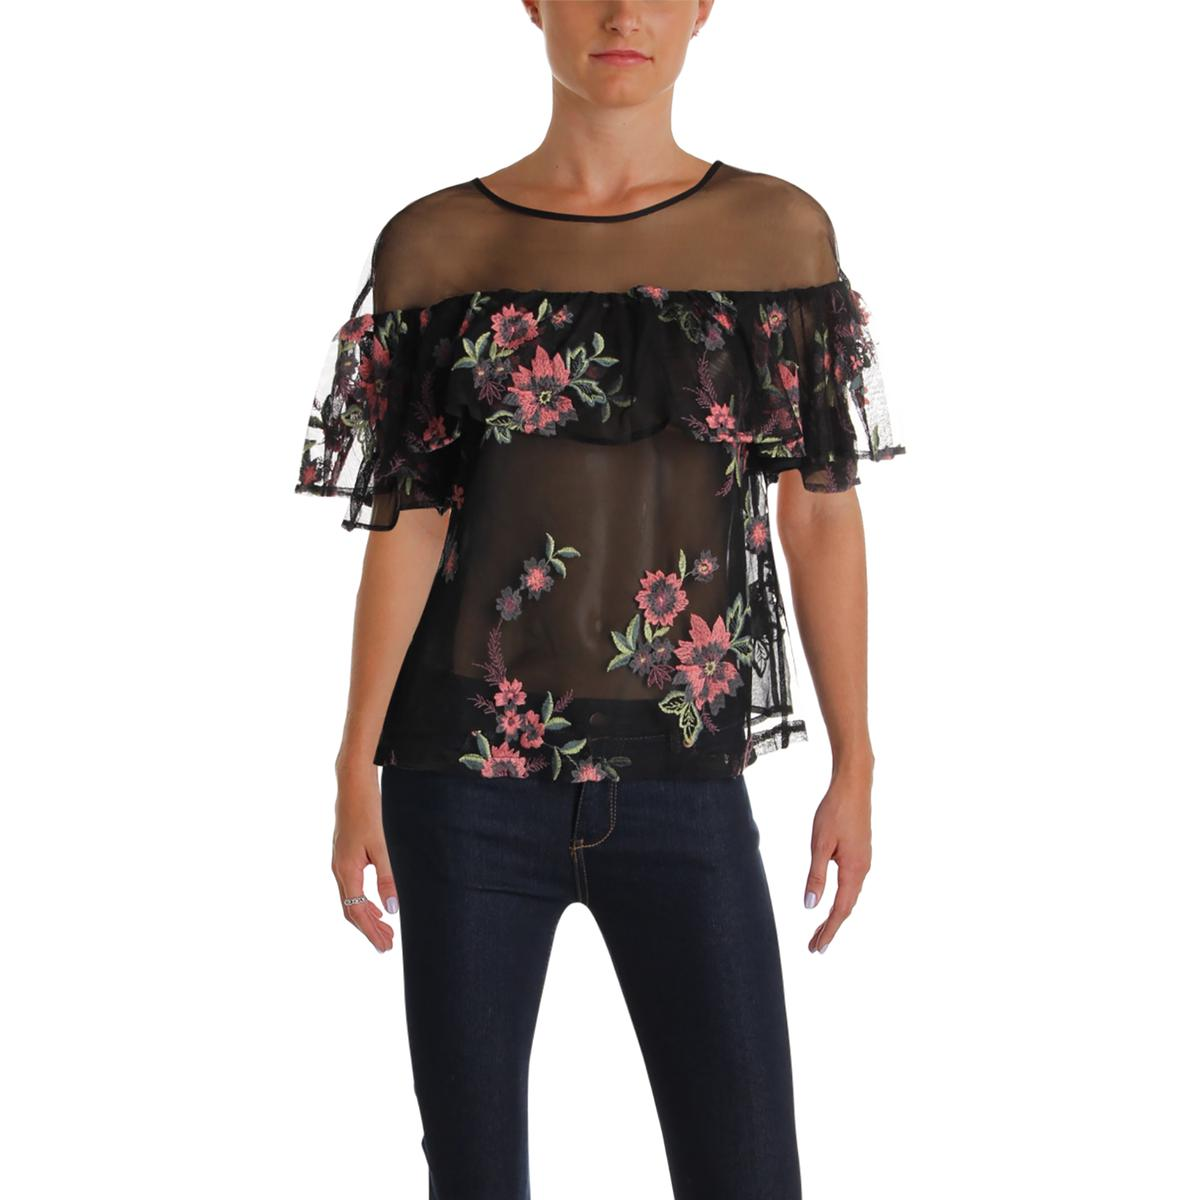 53c95a229aa BB Dakota Womens Rayna Black Mesh Floral Print Blouse Top S BHFO ...